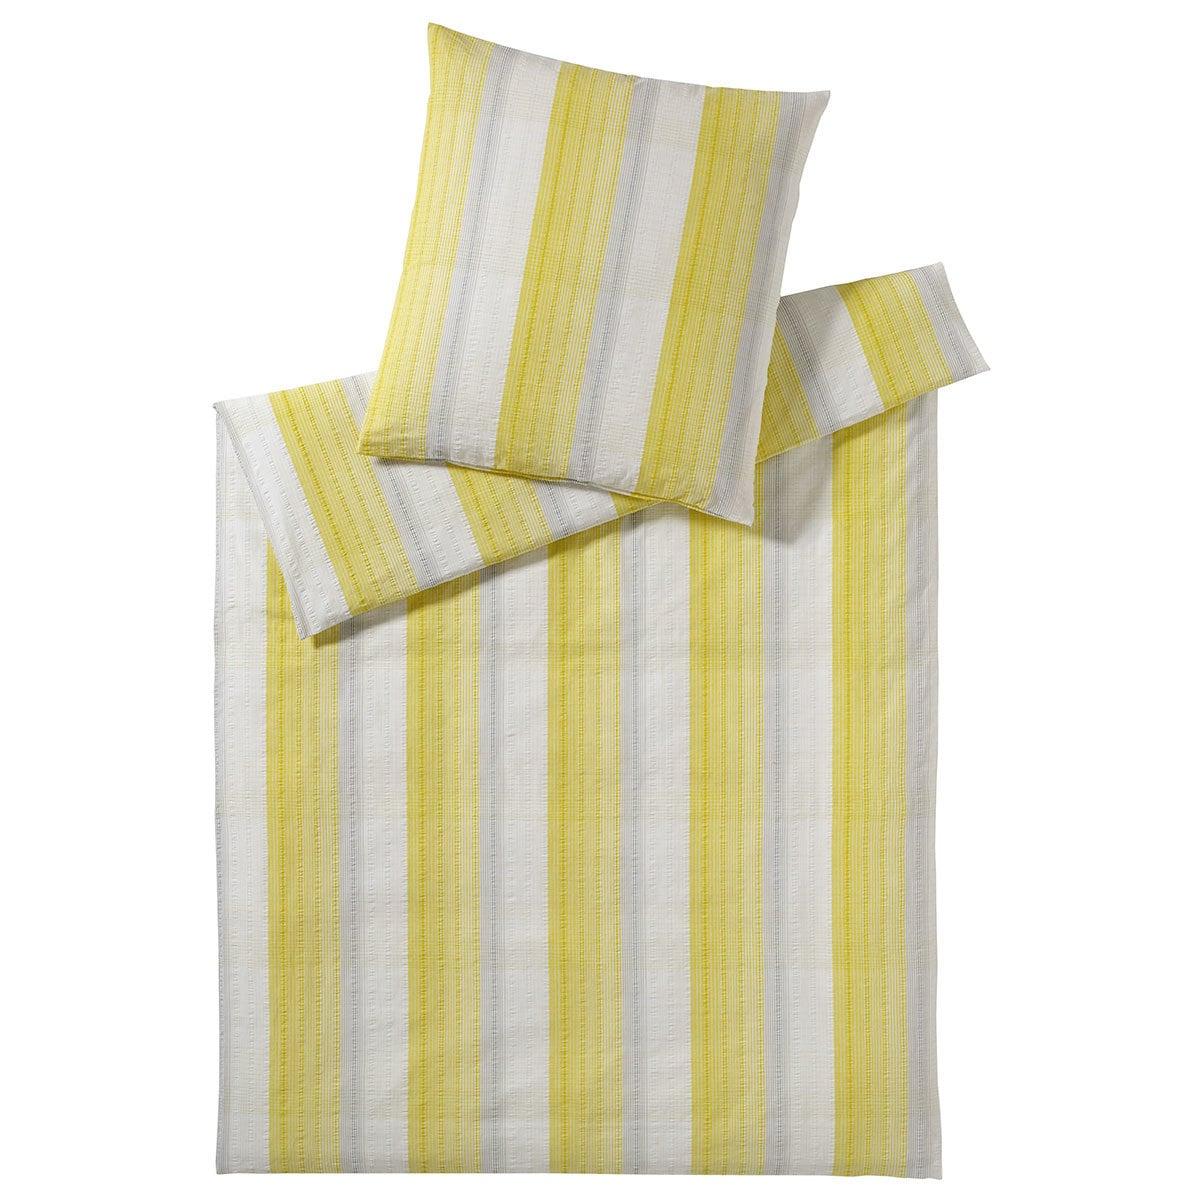 elegante seersucker bettw sche wembley yellow g nstig online kaufen bei bettwaren shop. Black Bedroom Furniture Sets. Home Design Ideas